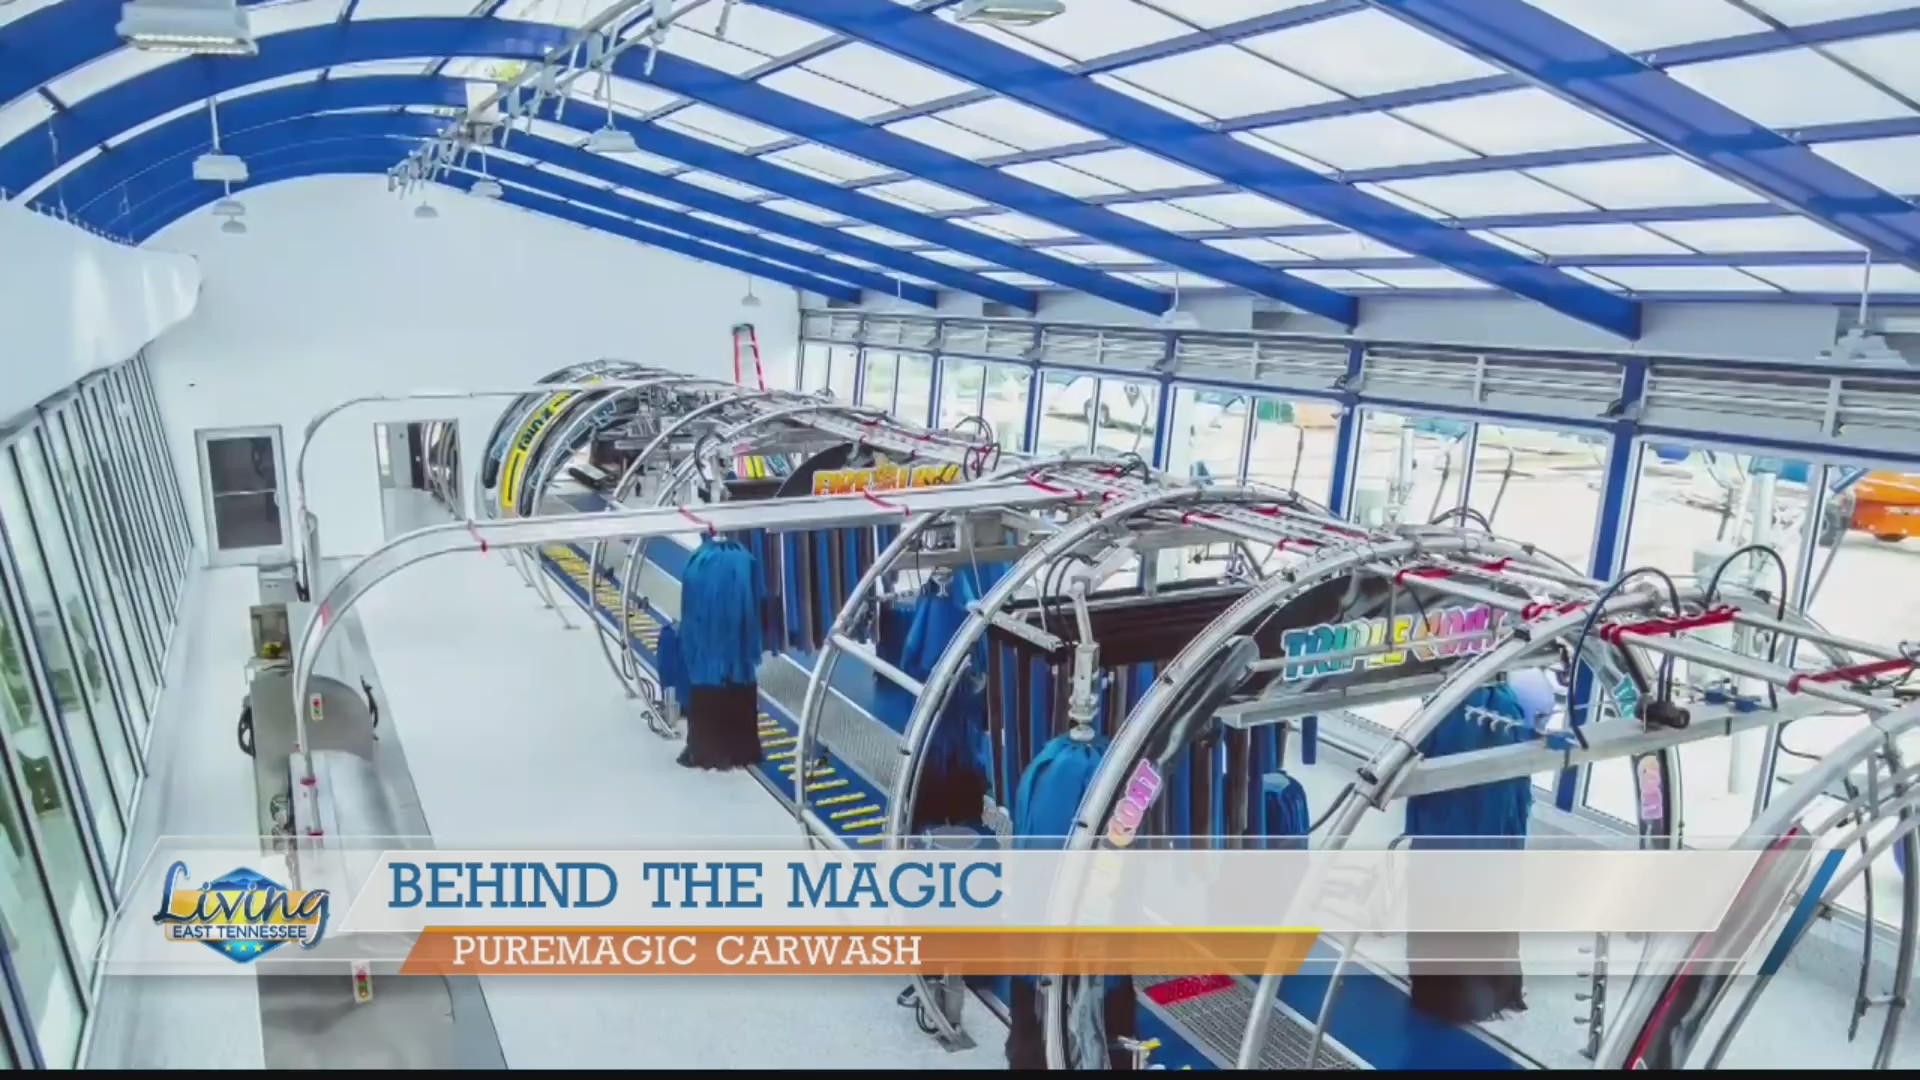 Taking you behind the magic at PureMagic Carwash | WATE